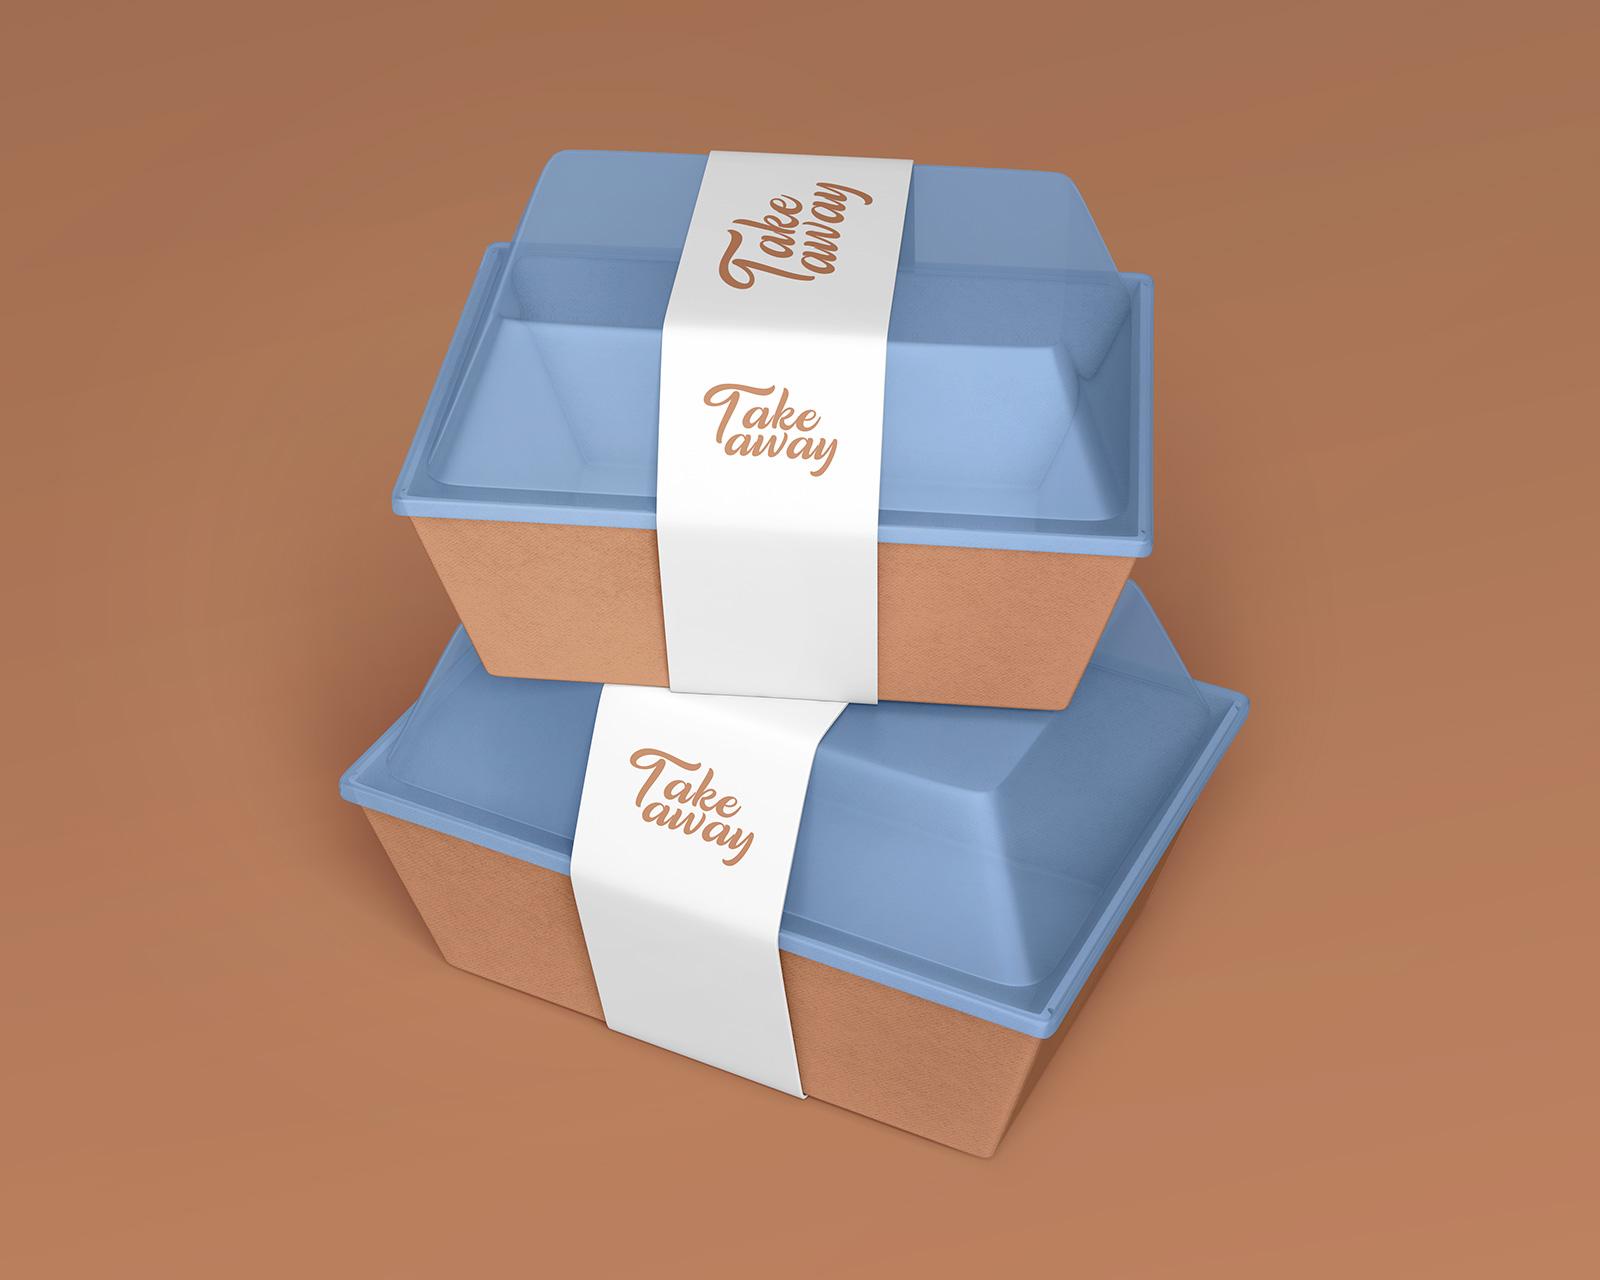 Download Free Take Away Plastic Box Food Container Mockup Psd Set Good Mockups